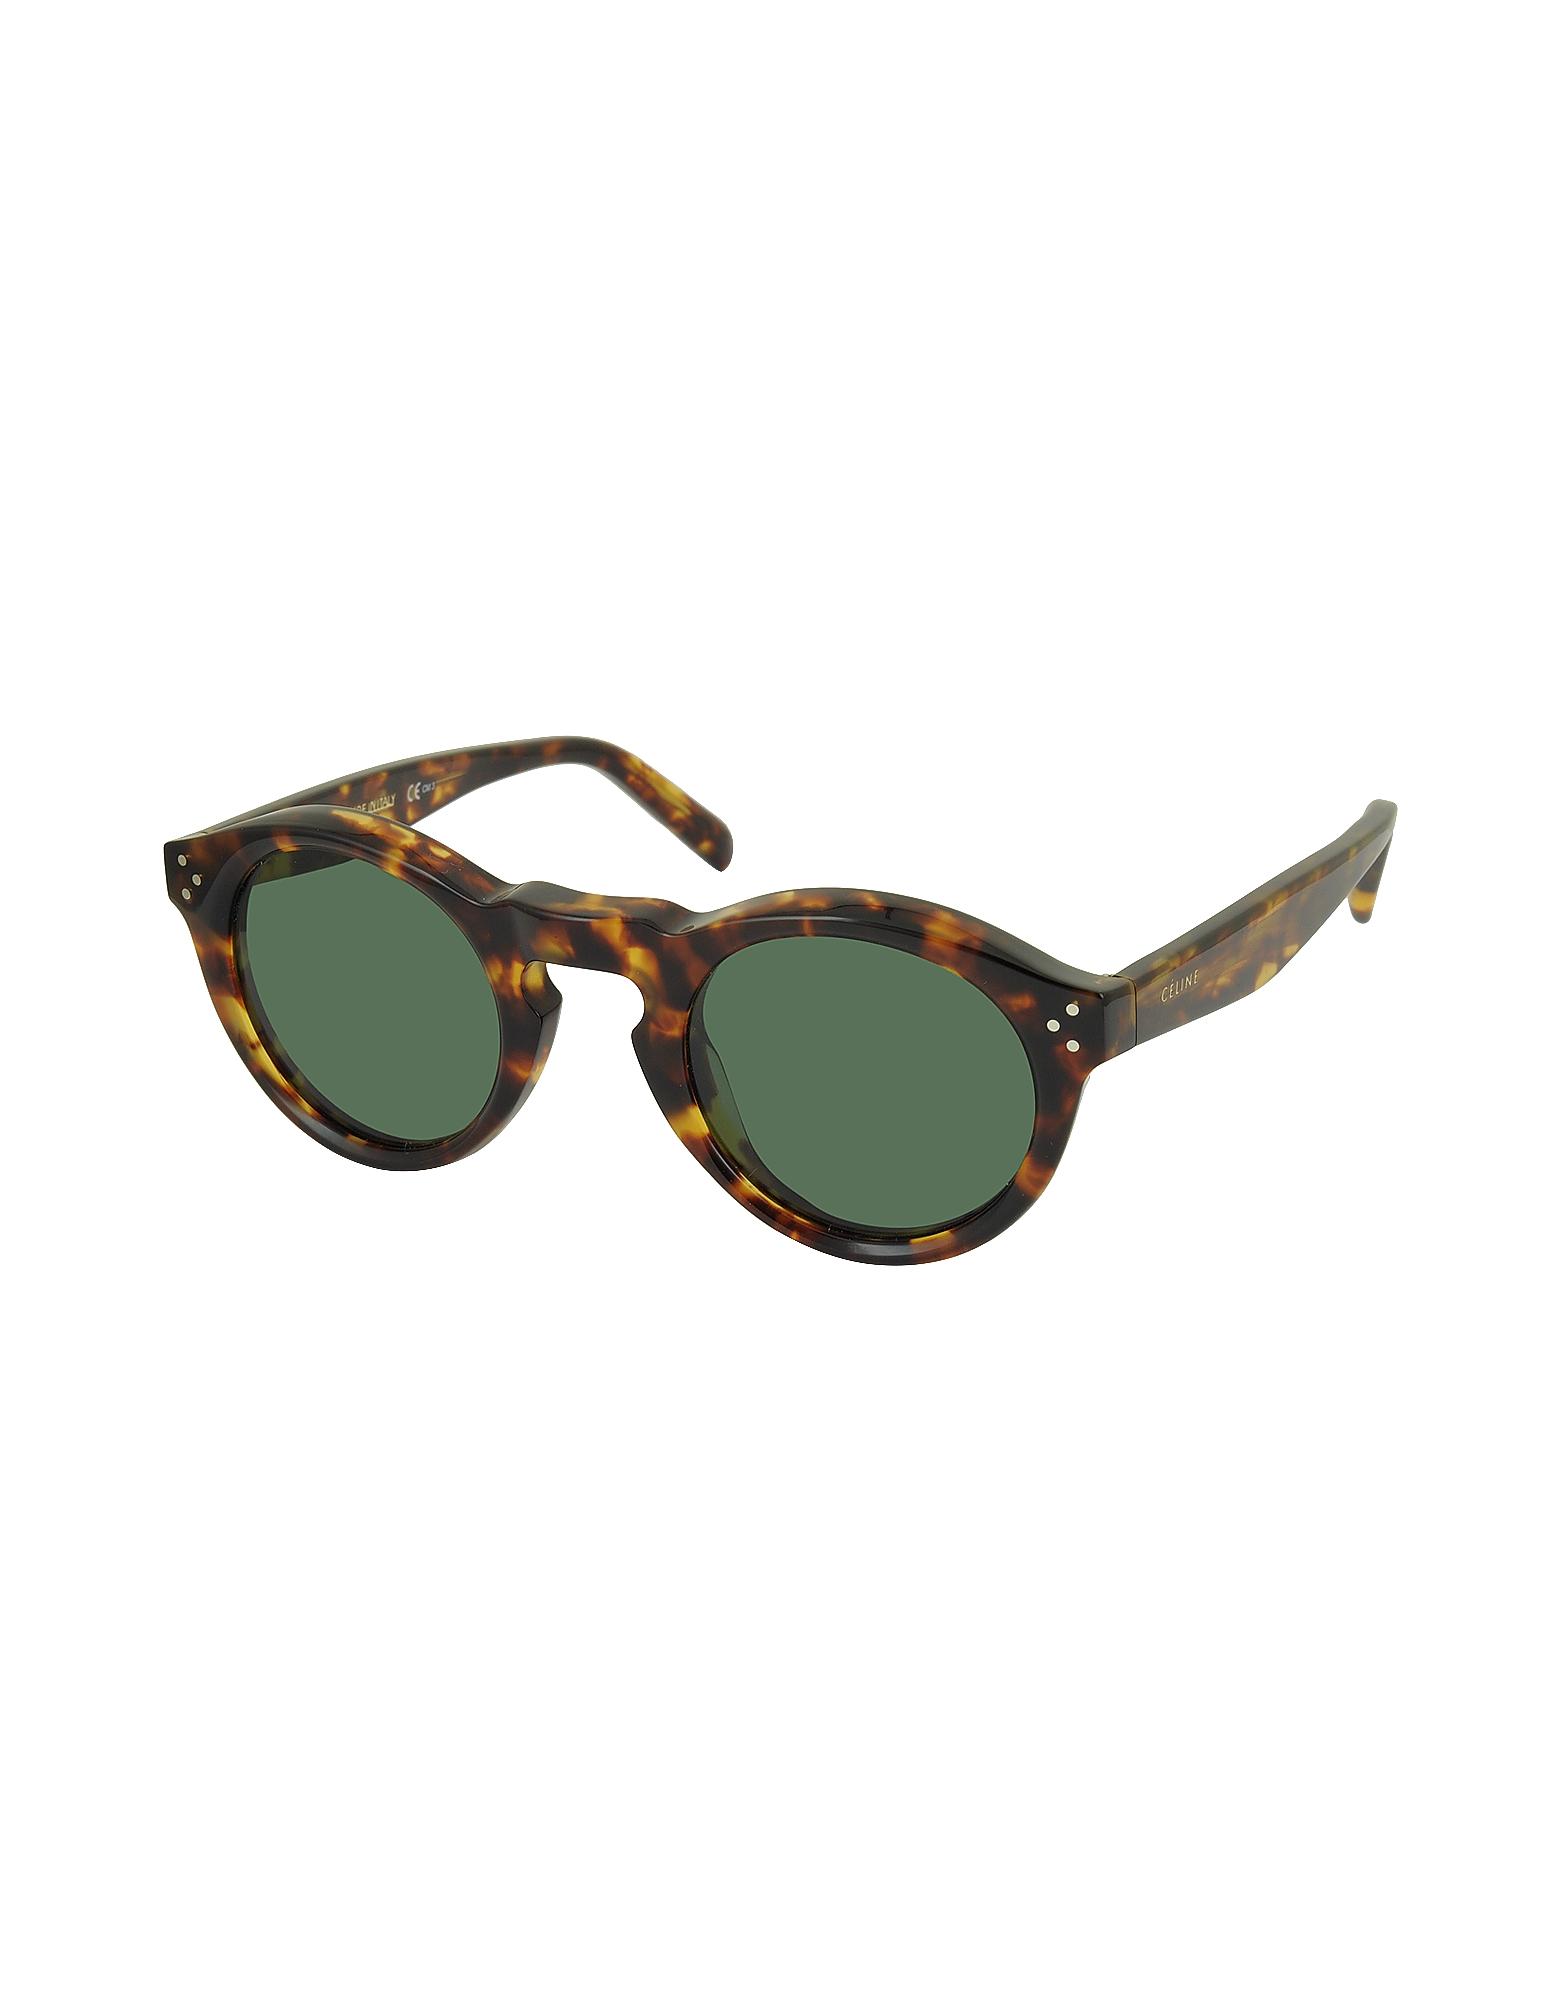 BEVEL CL 41370/S Acetate Round Unisex Sunglasses от Forzieri.com INT